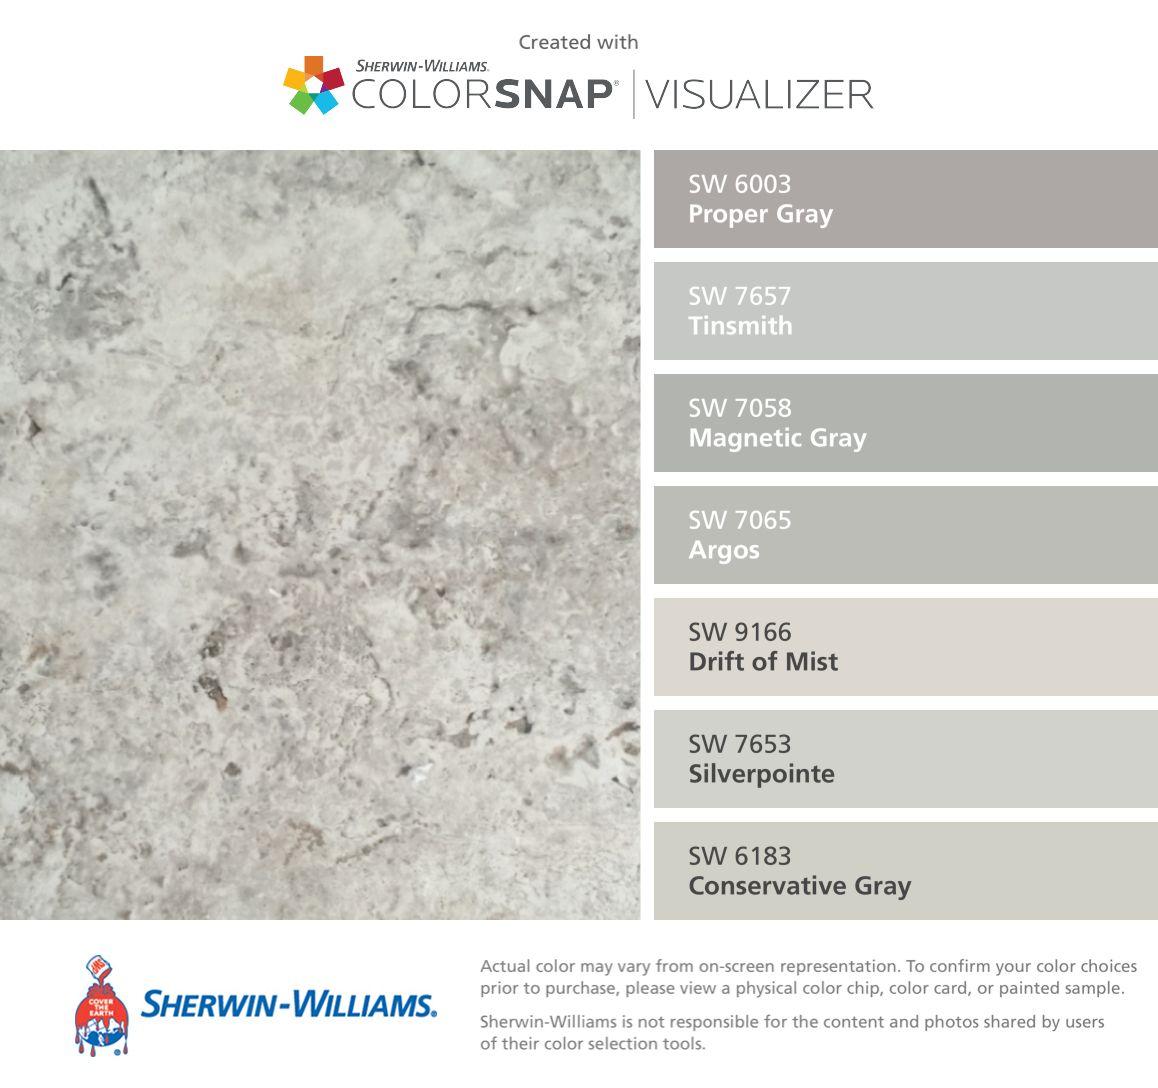 Sherwin Williams Proper Gray 6003